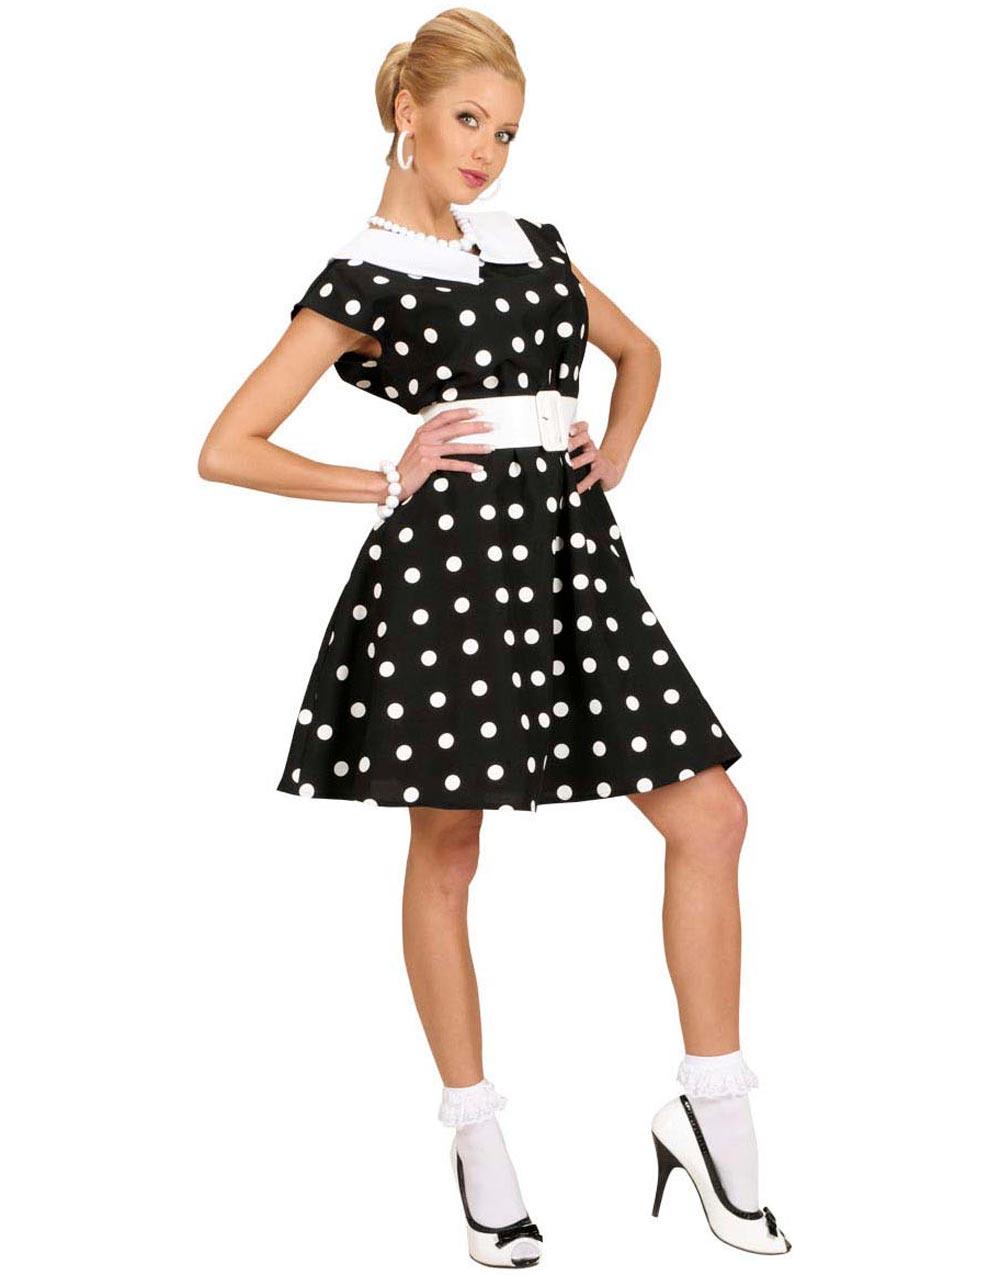 Talls Med Prikker Kjole Kostyme 50 Svart pdqWp6